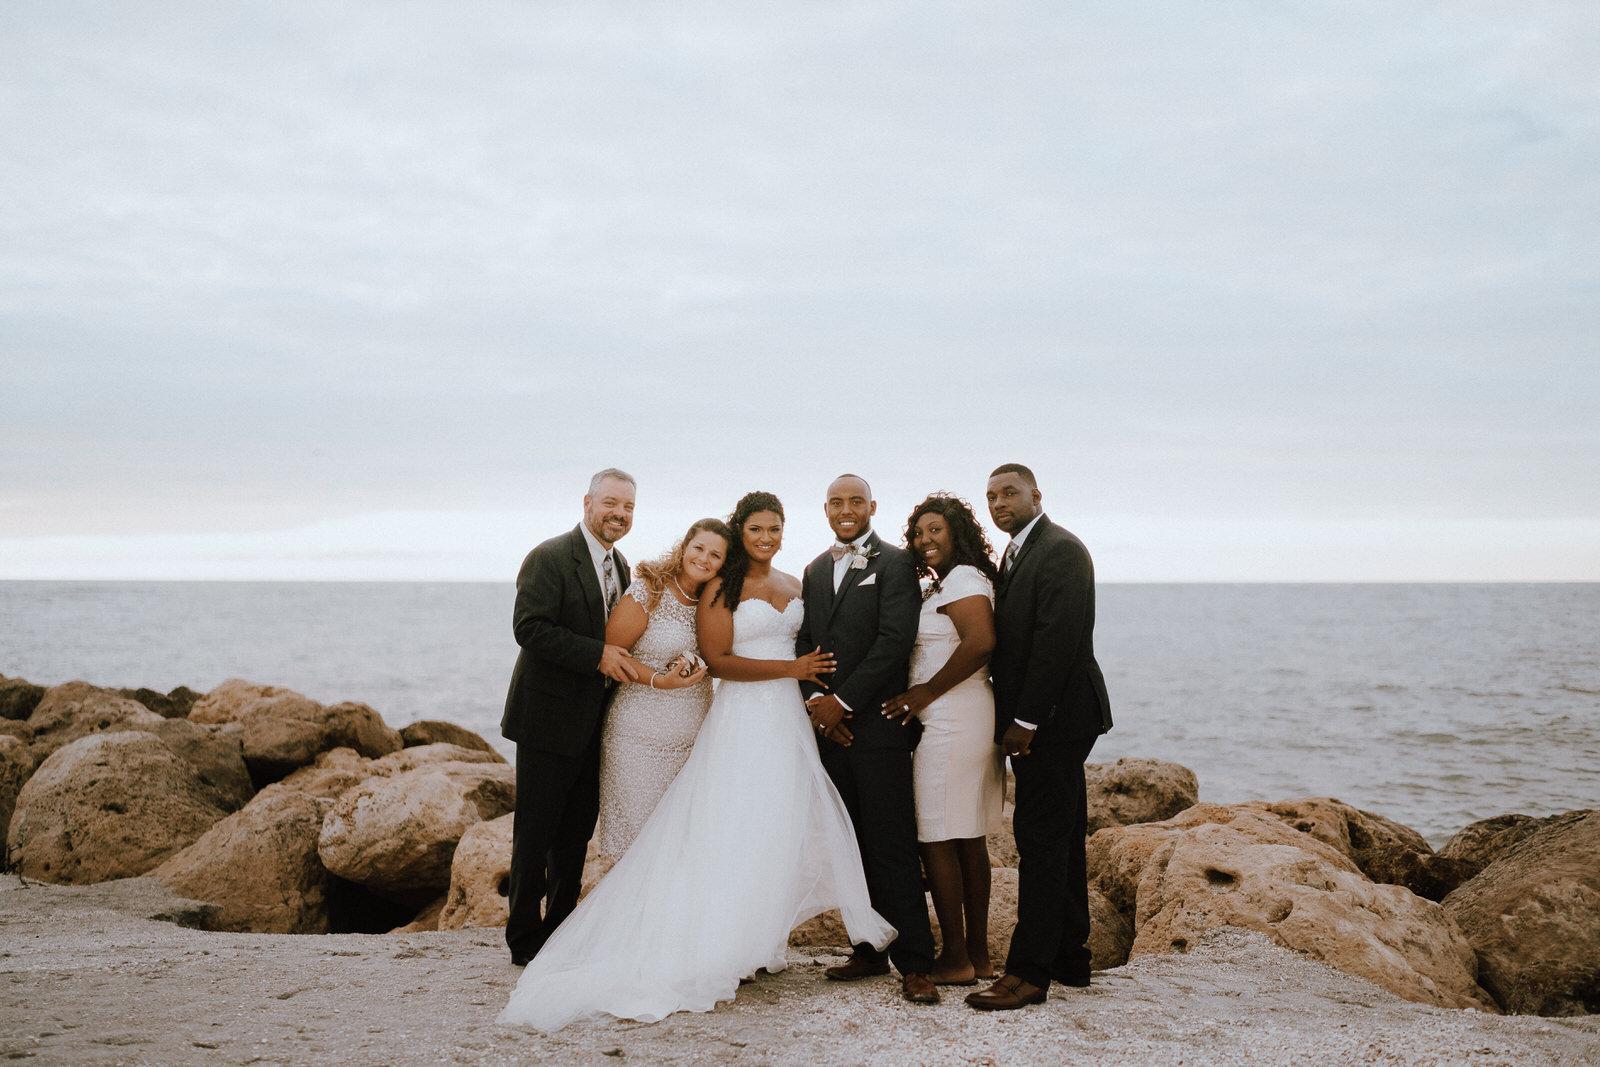 South Seas Island Resort Elopement- Alyana and Shawn- Michelle Gonzalez Photography-616.JPG